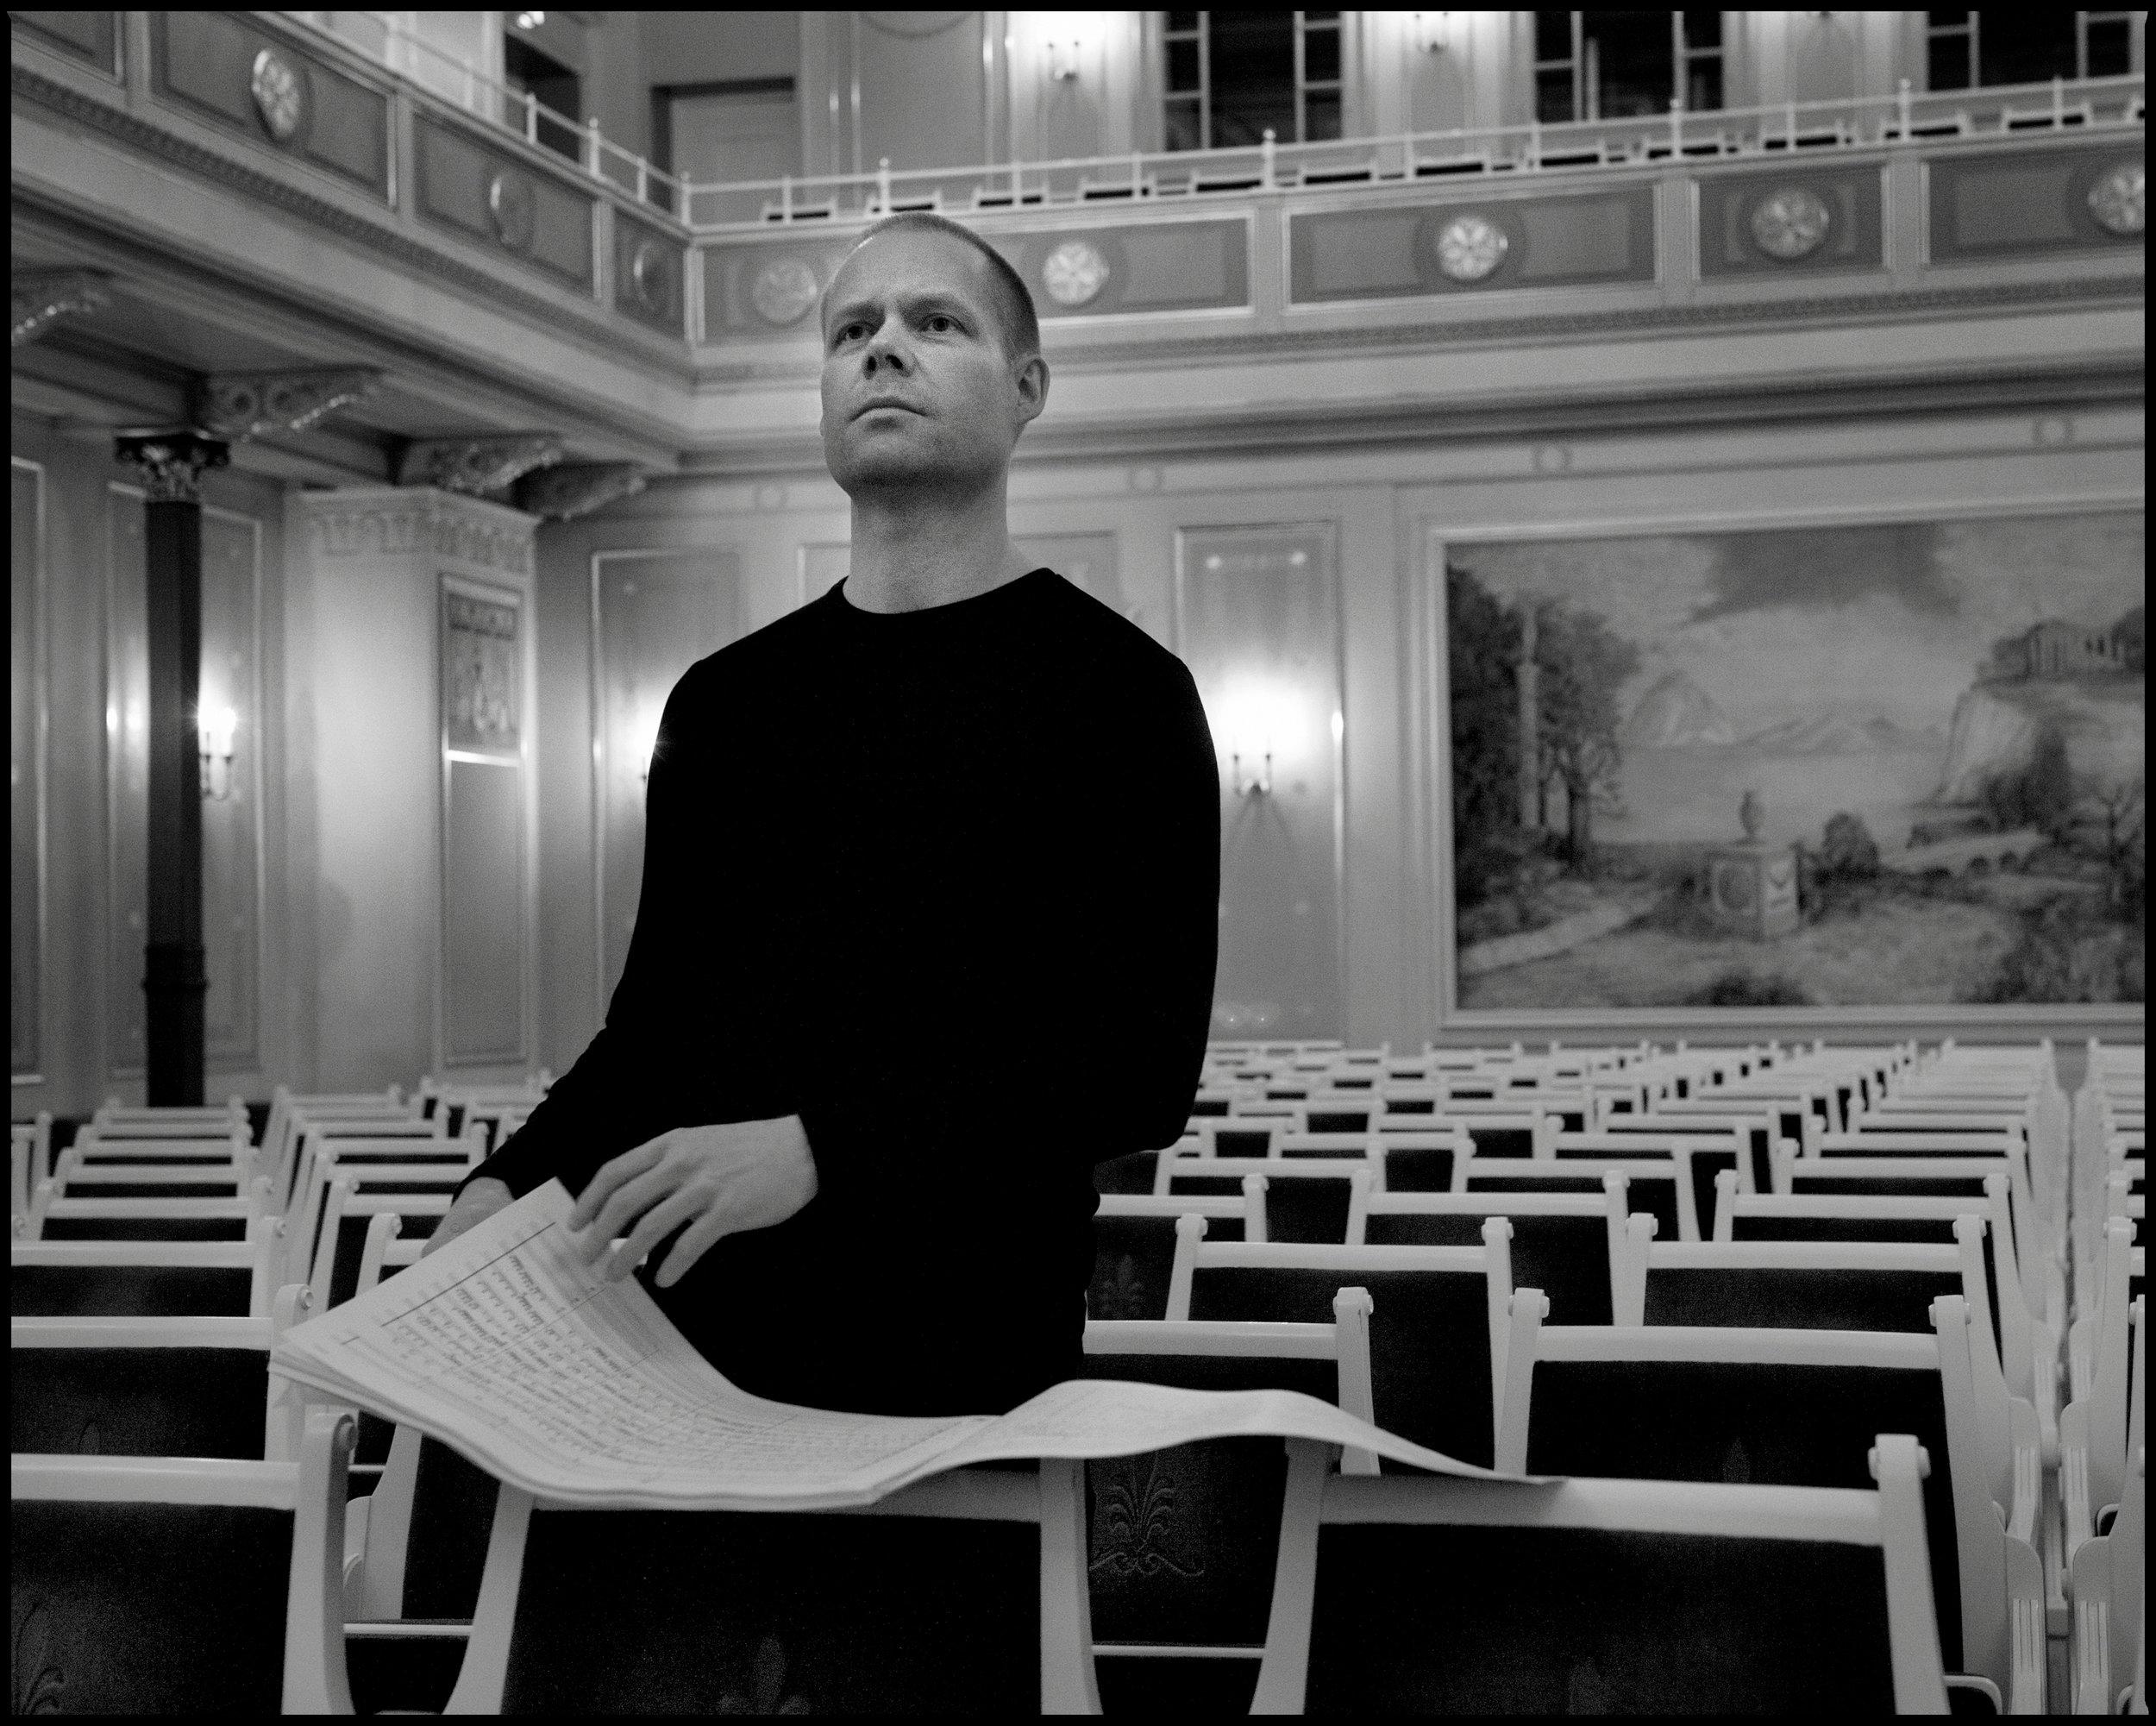 Max Richter - Composer